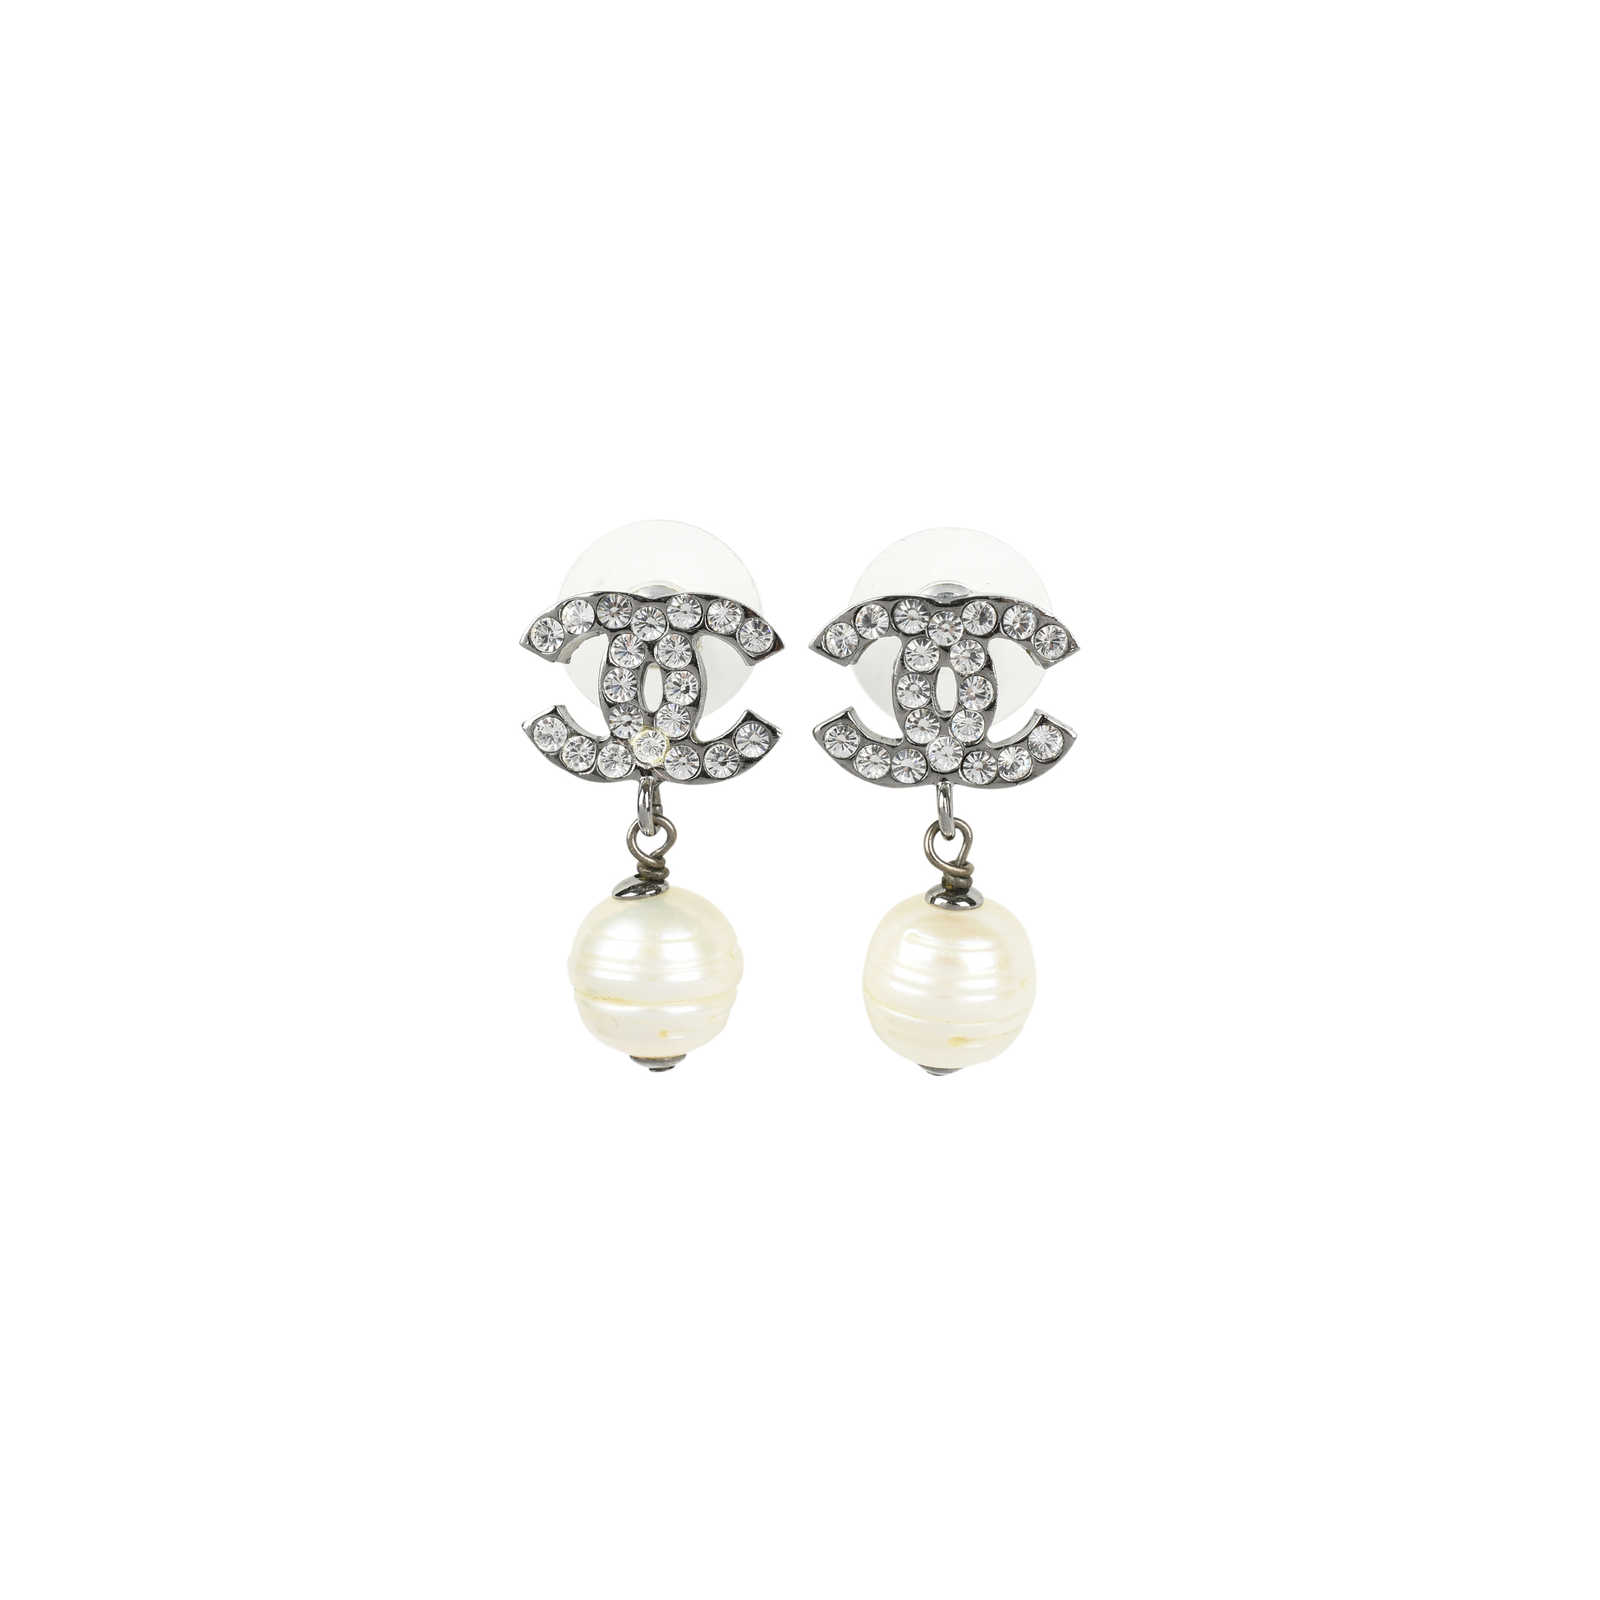 Chanel Cc Pearl Drop Earrings Metallic Thumbnail 0